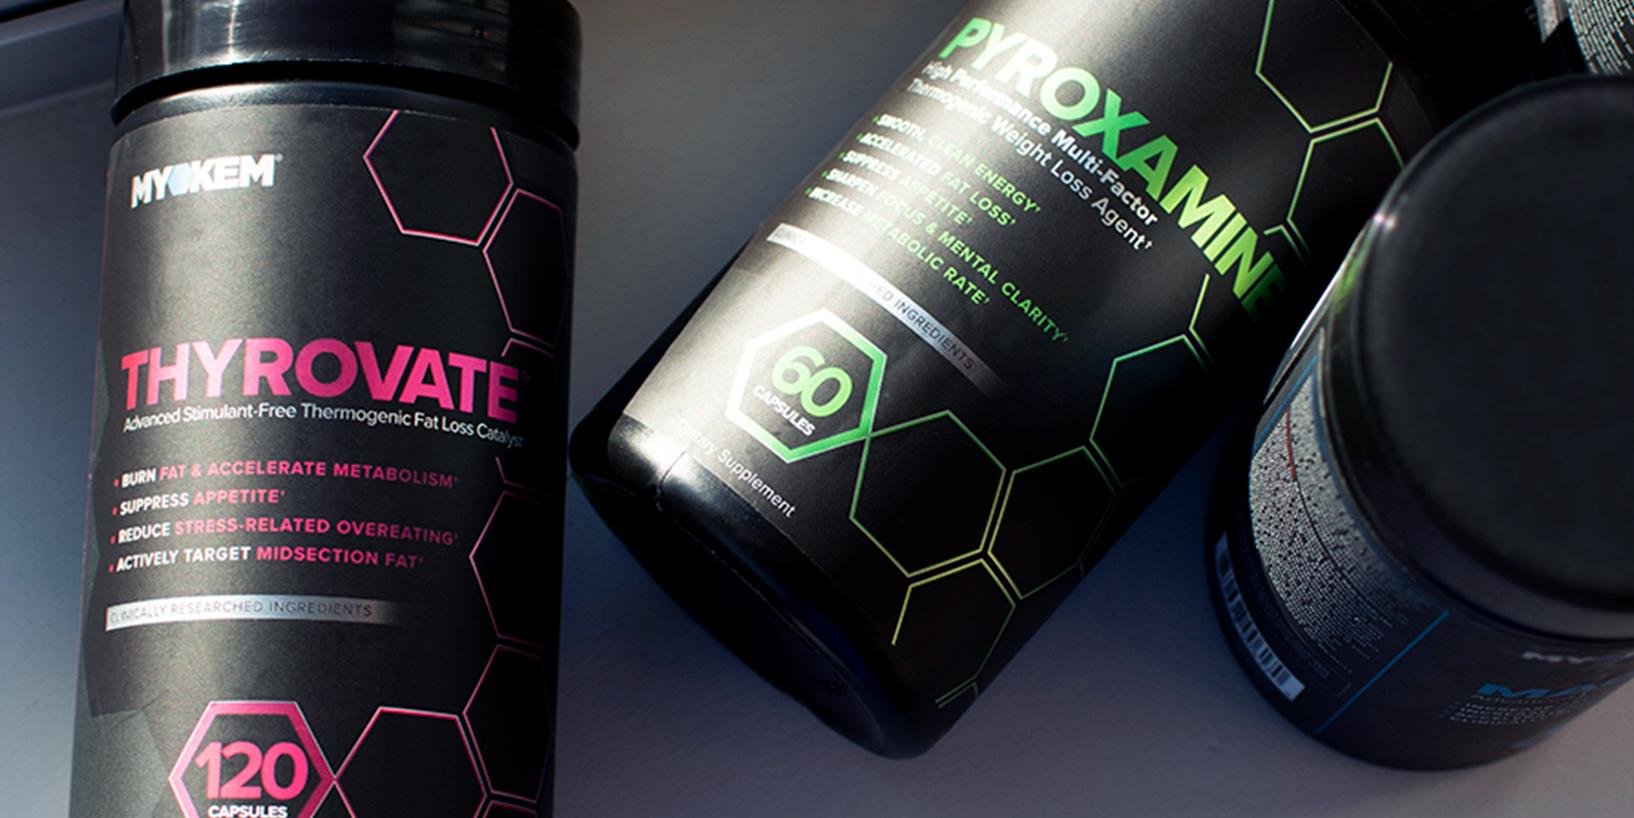 Thyrovate and Pyroxamine both contain Bioperine